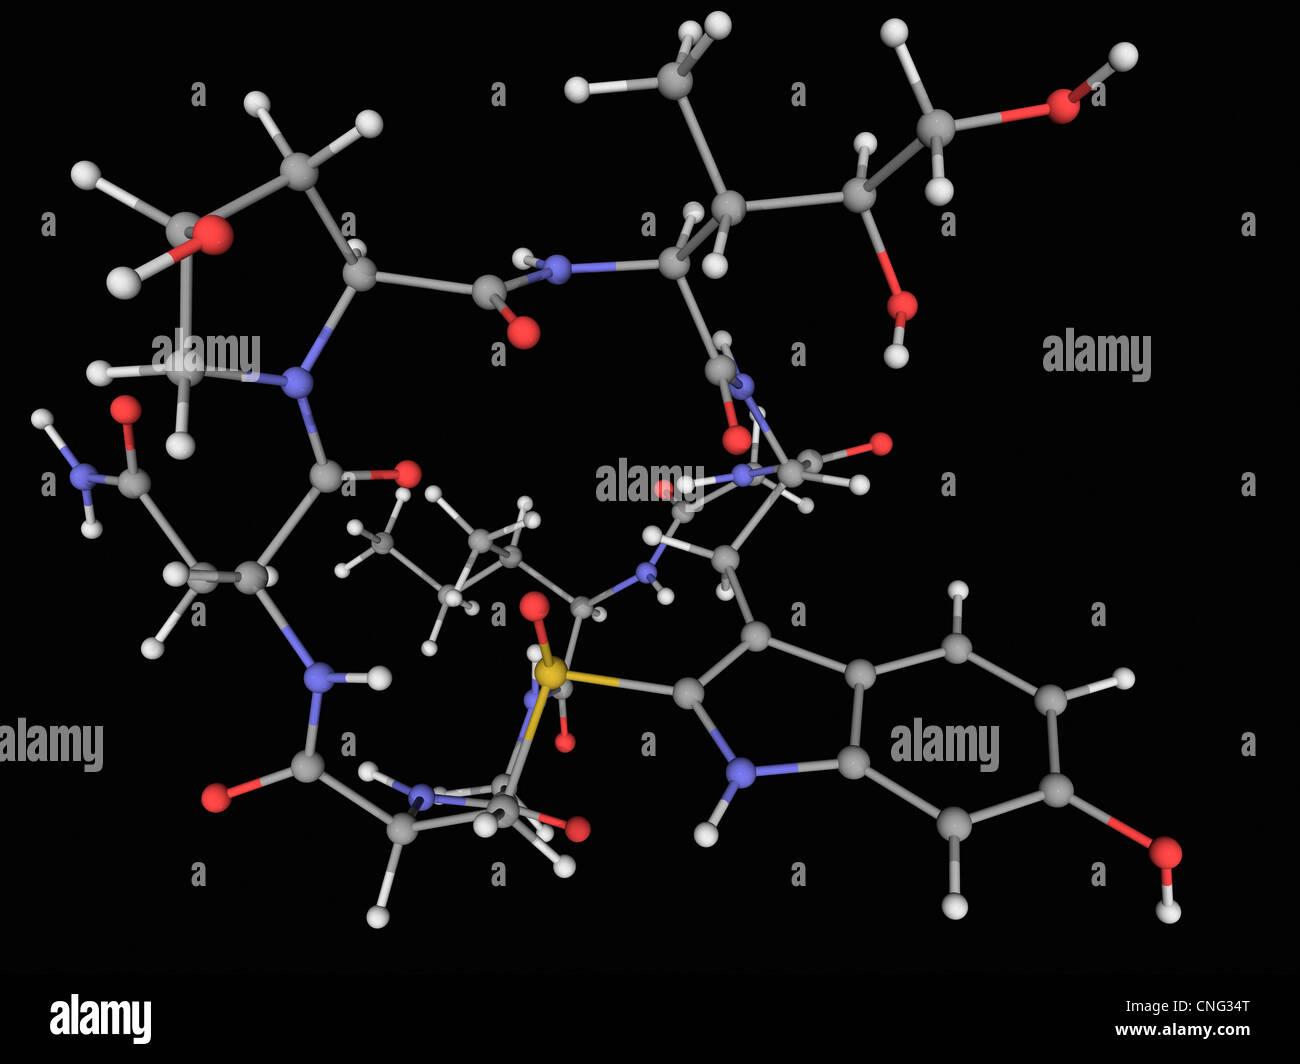 Alpha-Amanitin toxin molecule - Stock Image